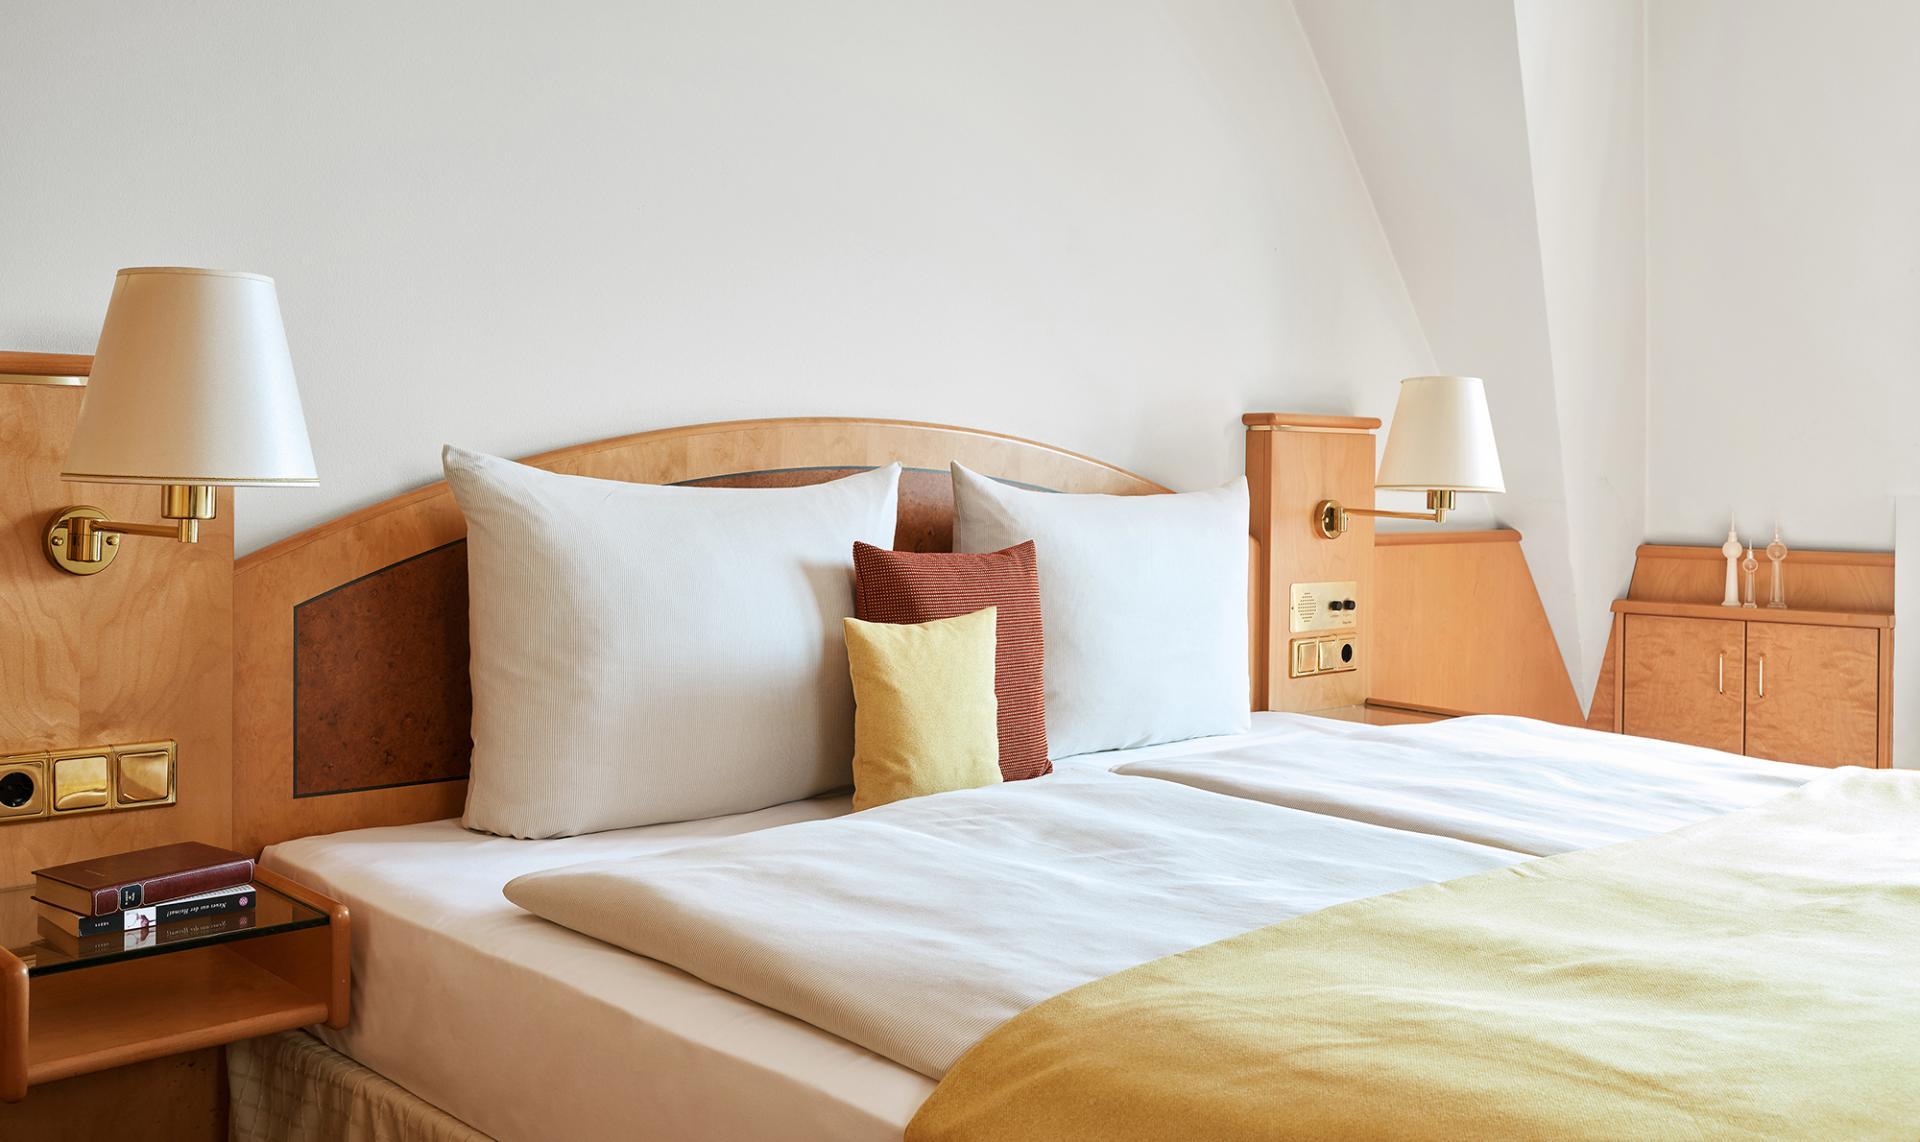 Bedroom at Living Hotel Grosser Kurfurst Apartments, Berlin Mitte, Berlin